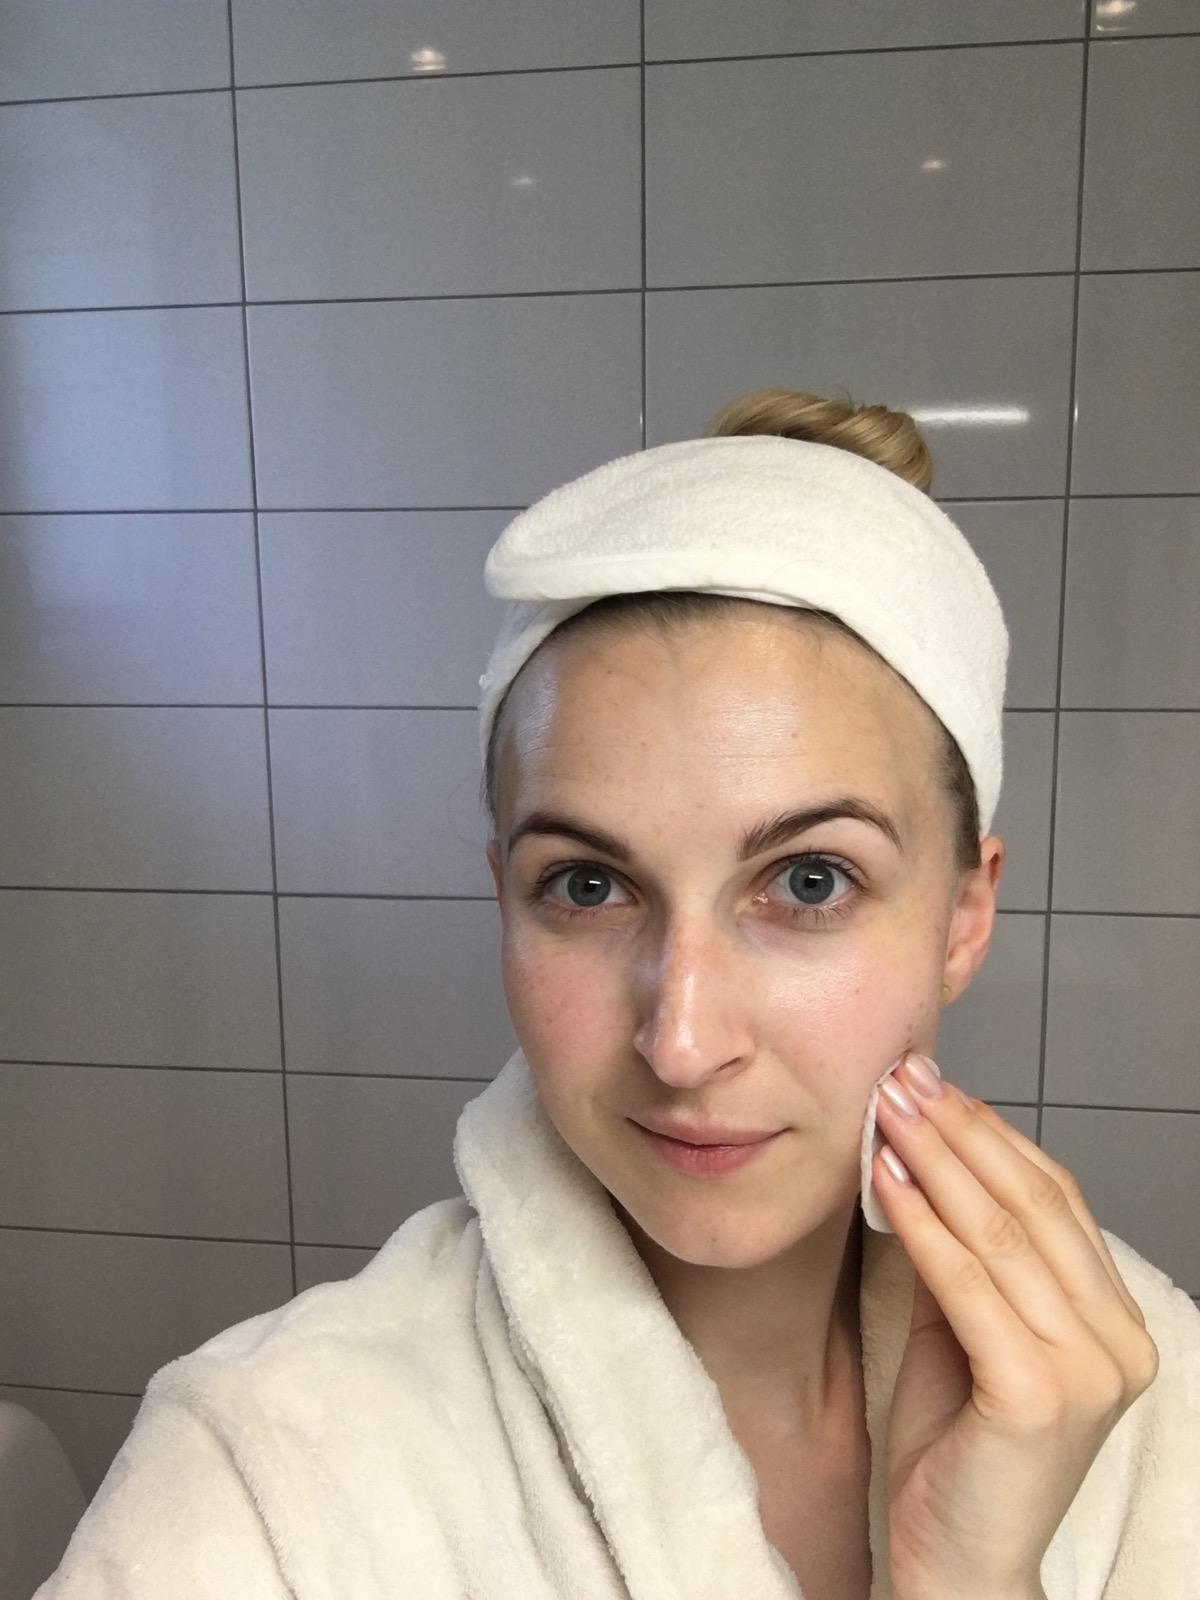 Exuviance Skin Rise Bionic Tonic Pads skönhetssnack.se IMG_6977